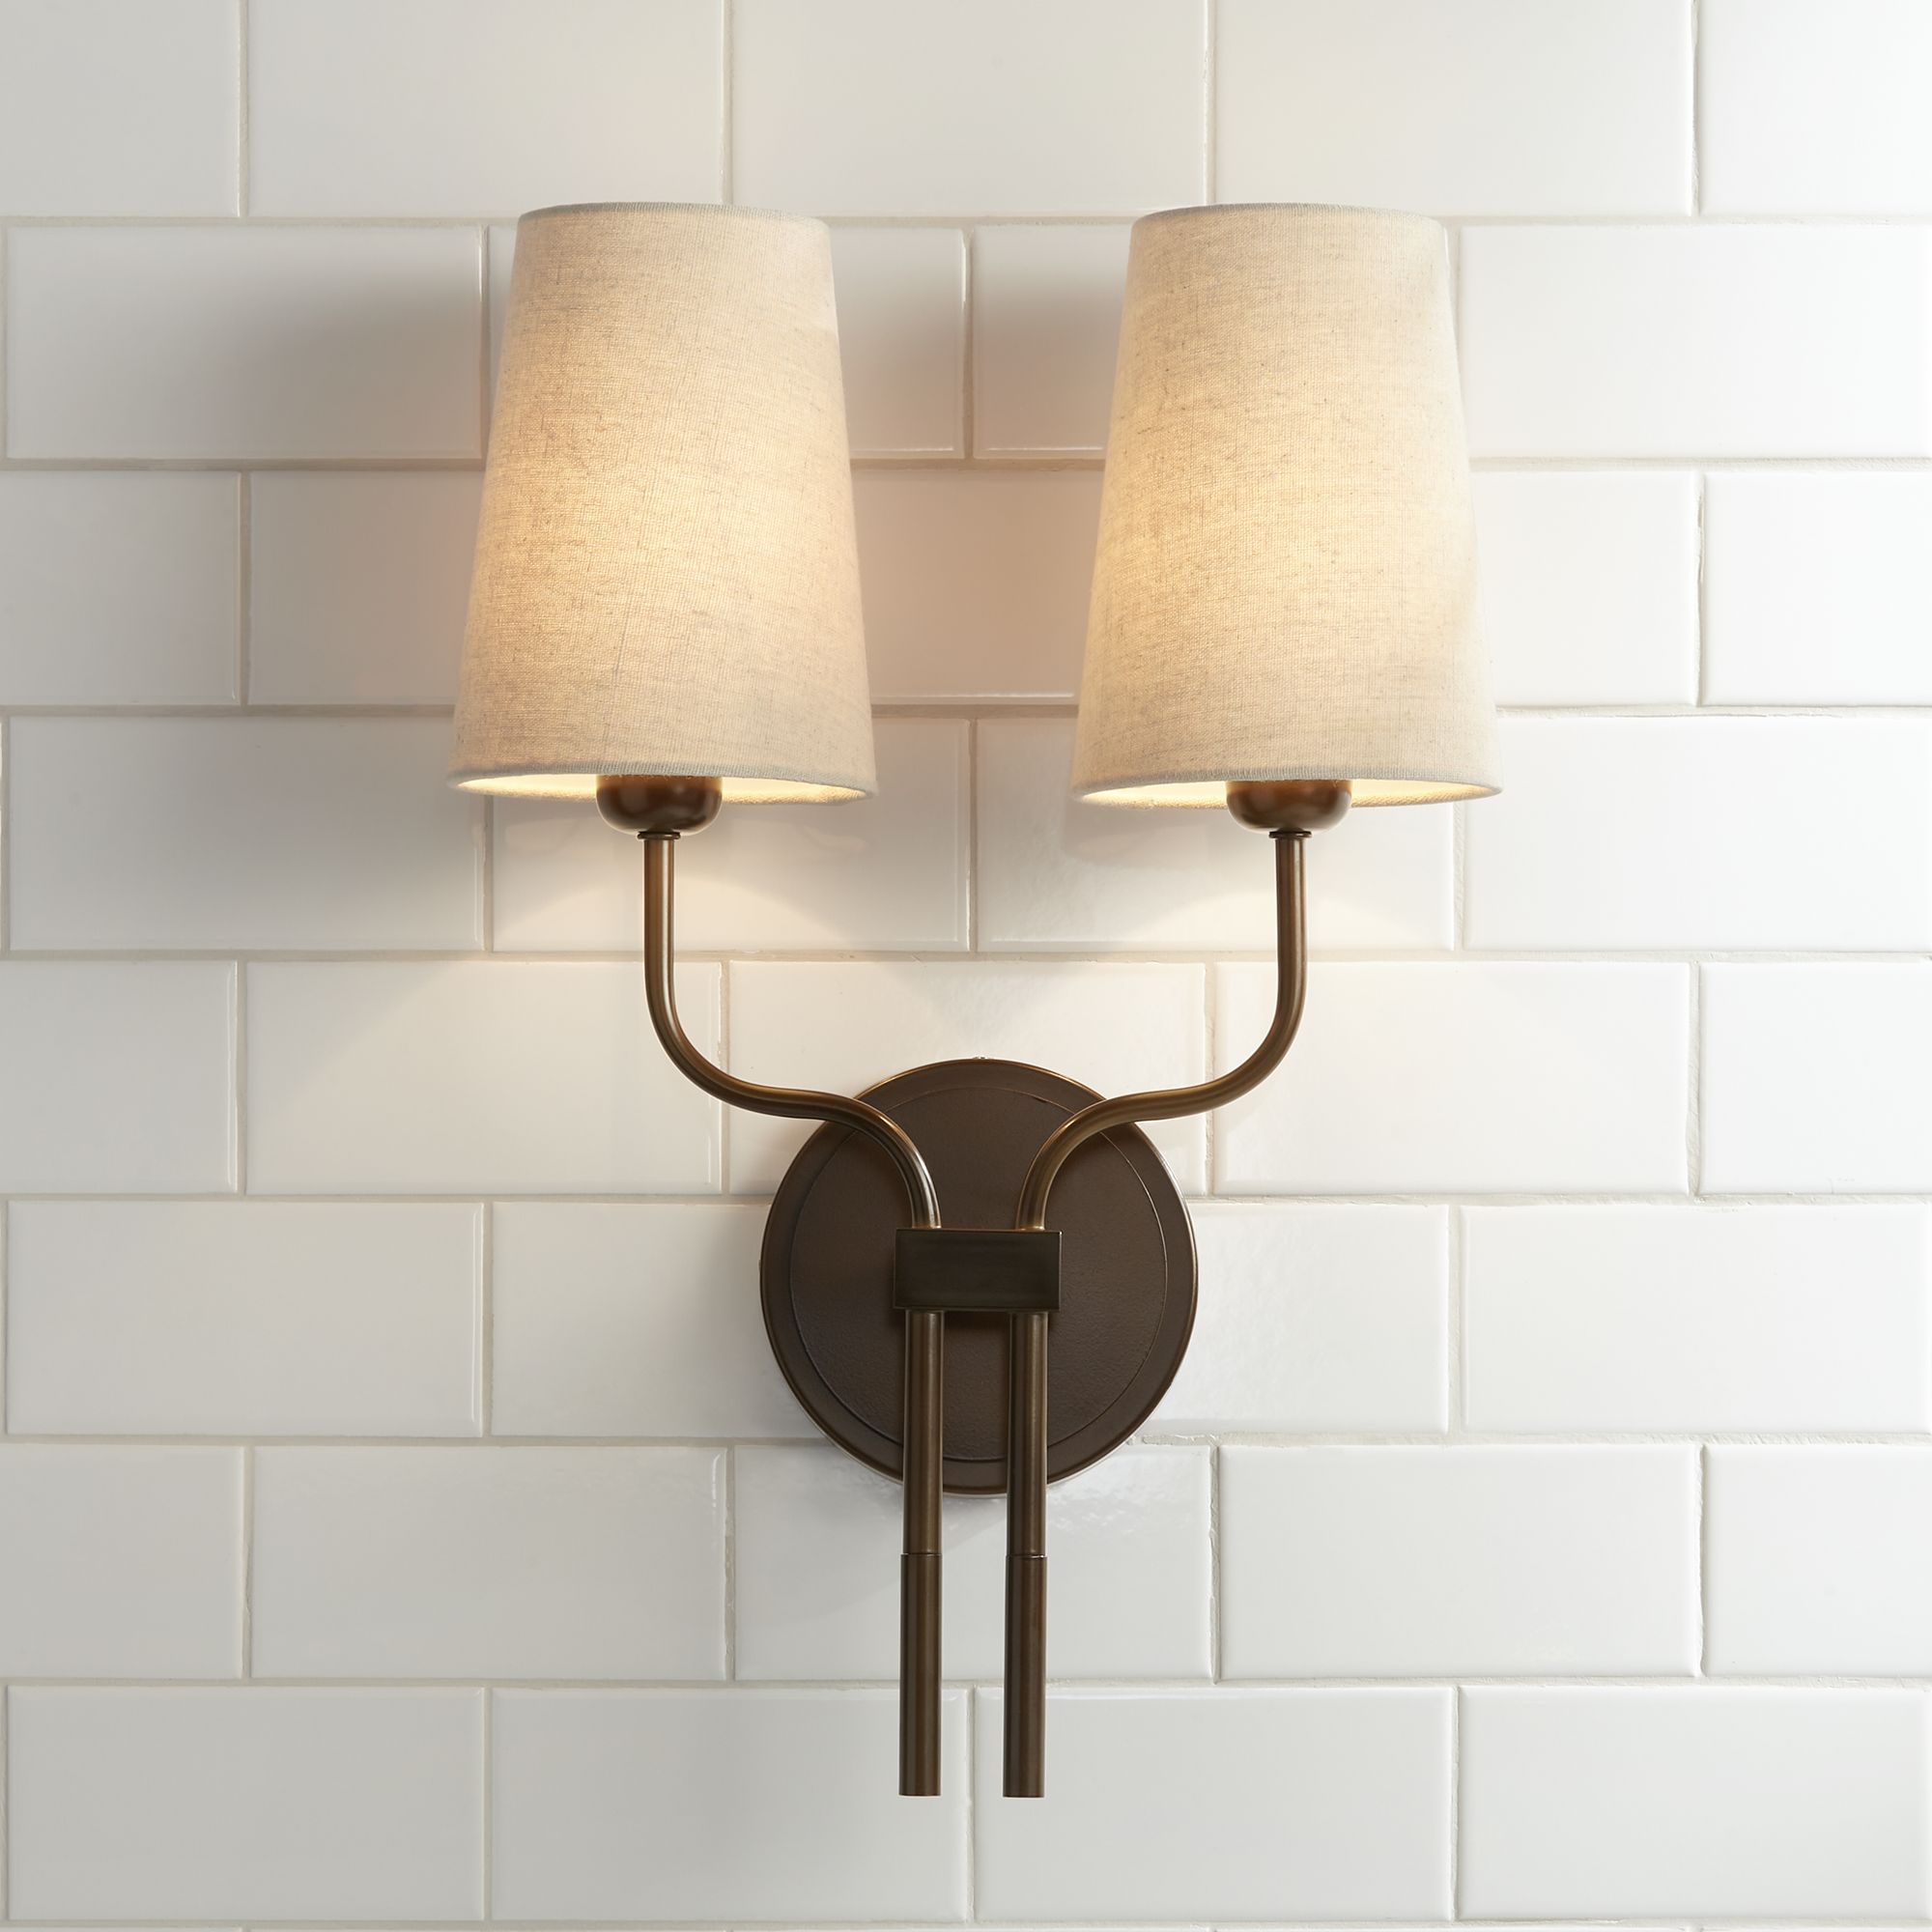 possini euro design modern wall sconce lighting bronze hardwired 19 1 2 high 2 light fixture oatmeal fabric for bedroom bathroom walmart com